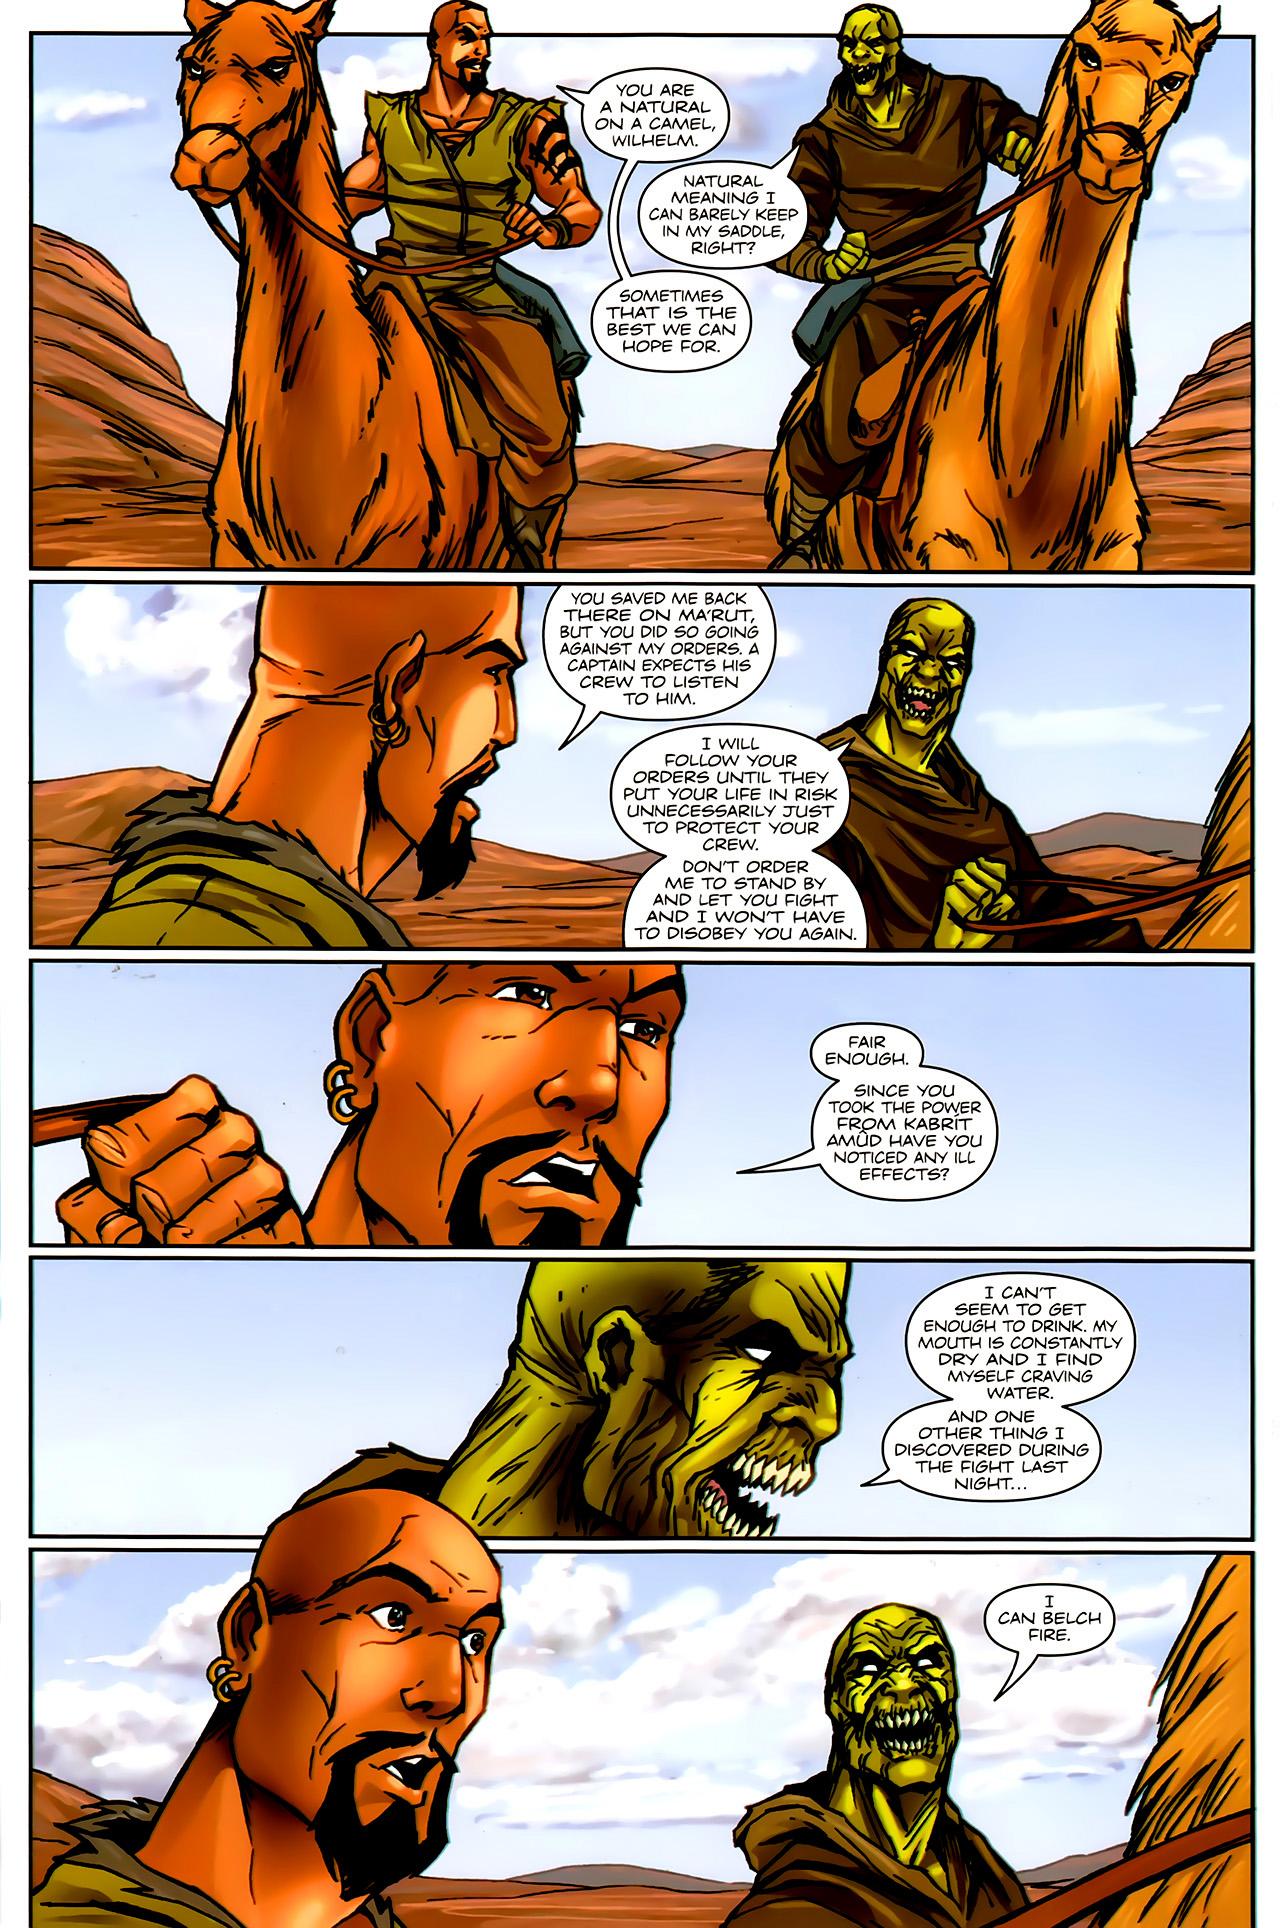 Read online 1001 Arabian Nights: The Adventures of Sinbad comic -  Issue #9 - 12